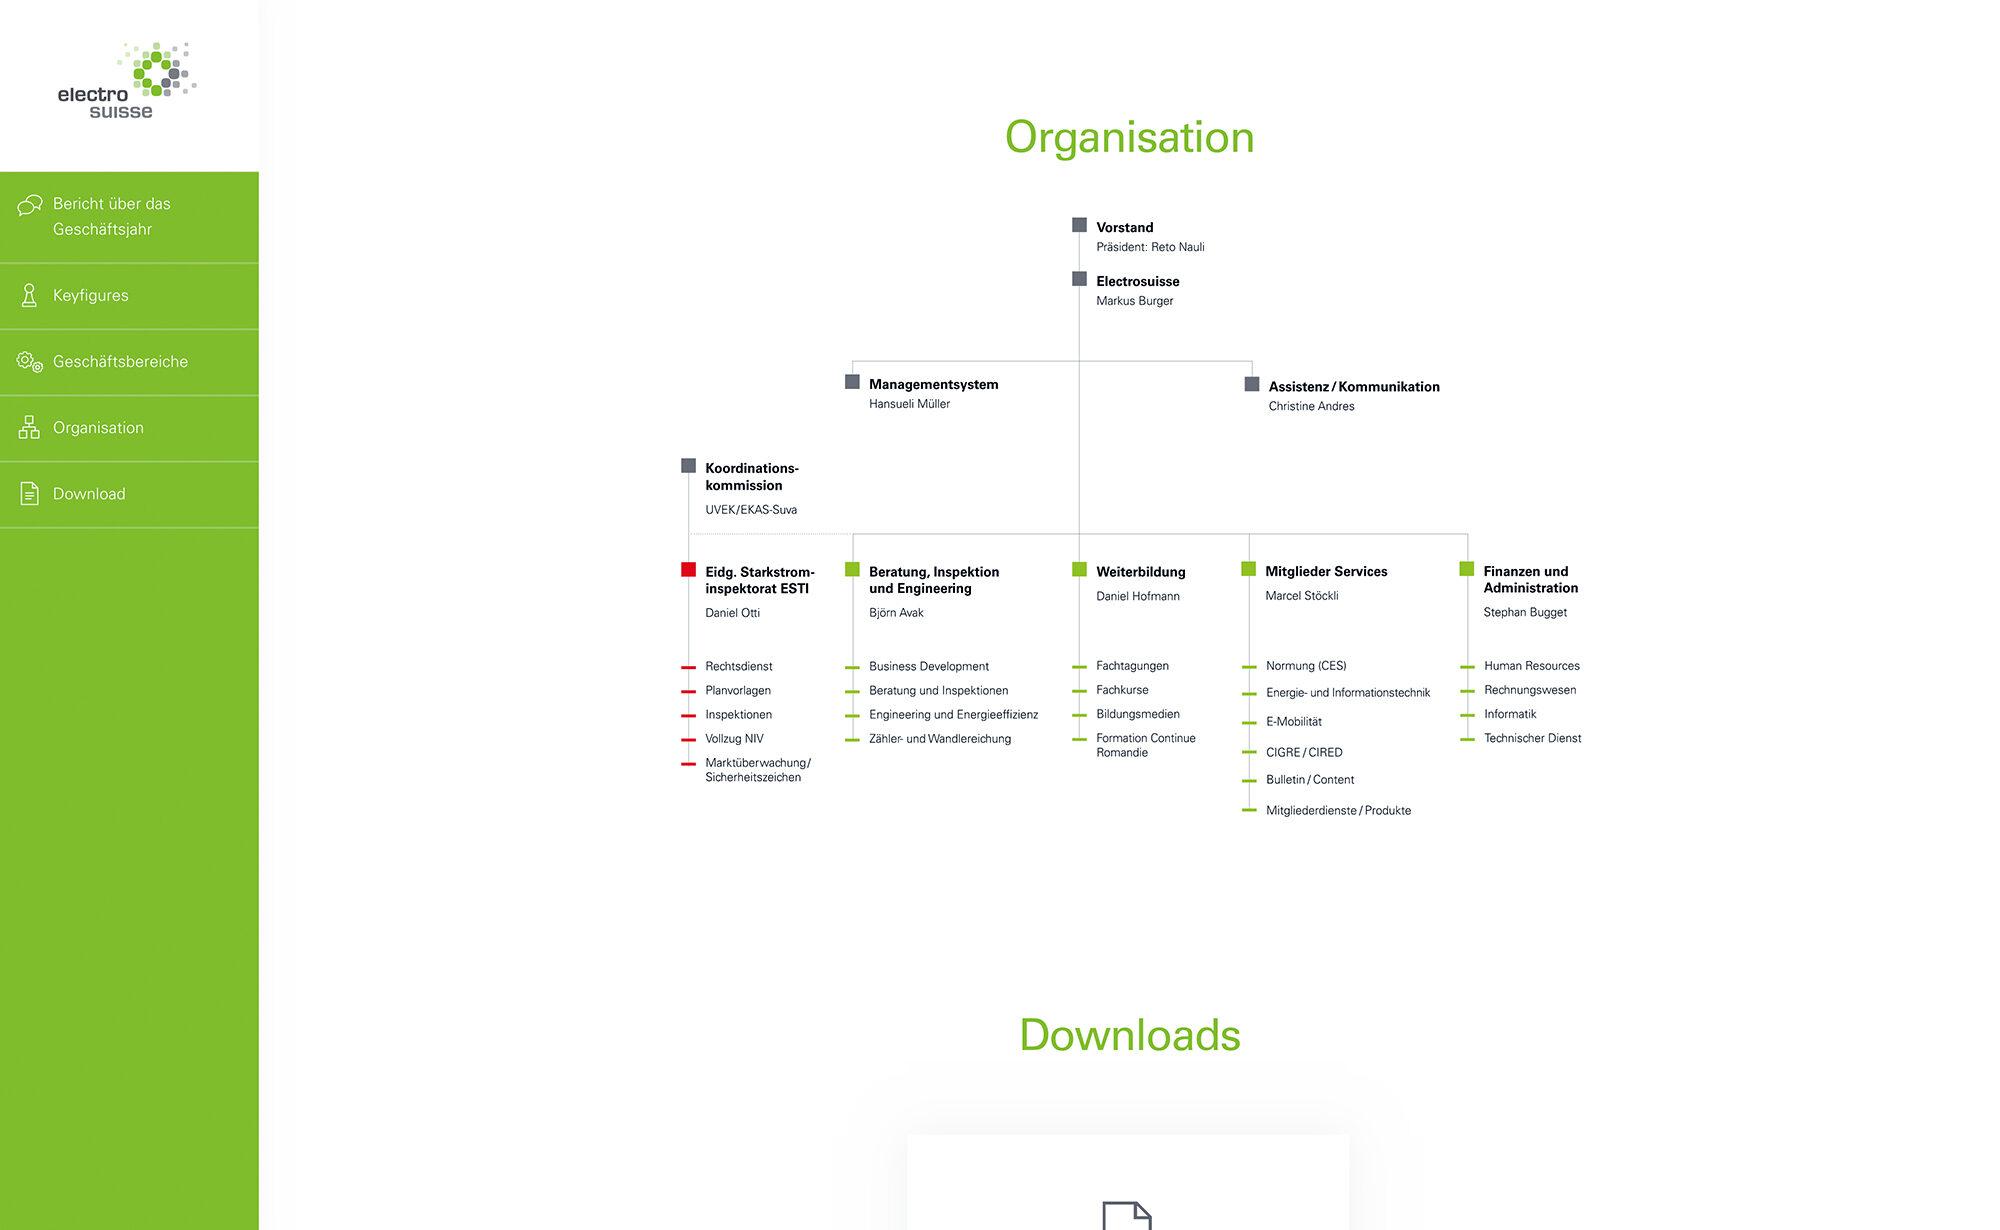 Organisation - Website Screenshot, Electrosuisse Digitaler Geschäftsbericht